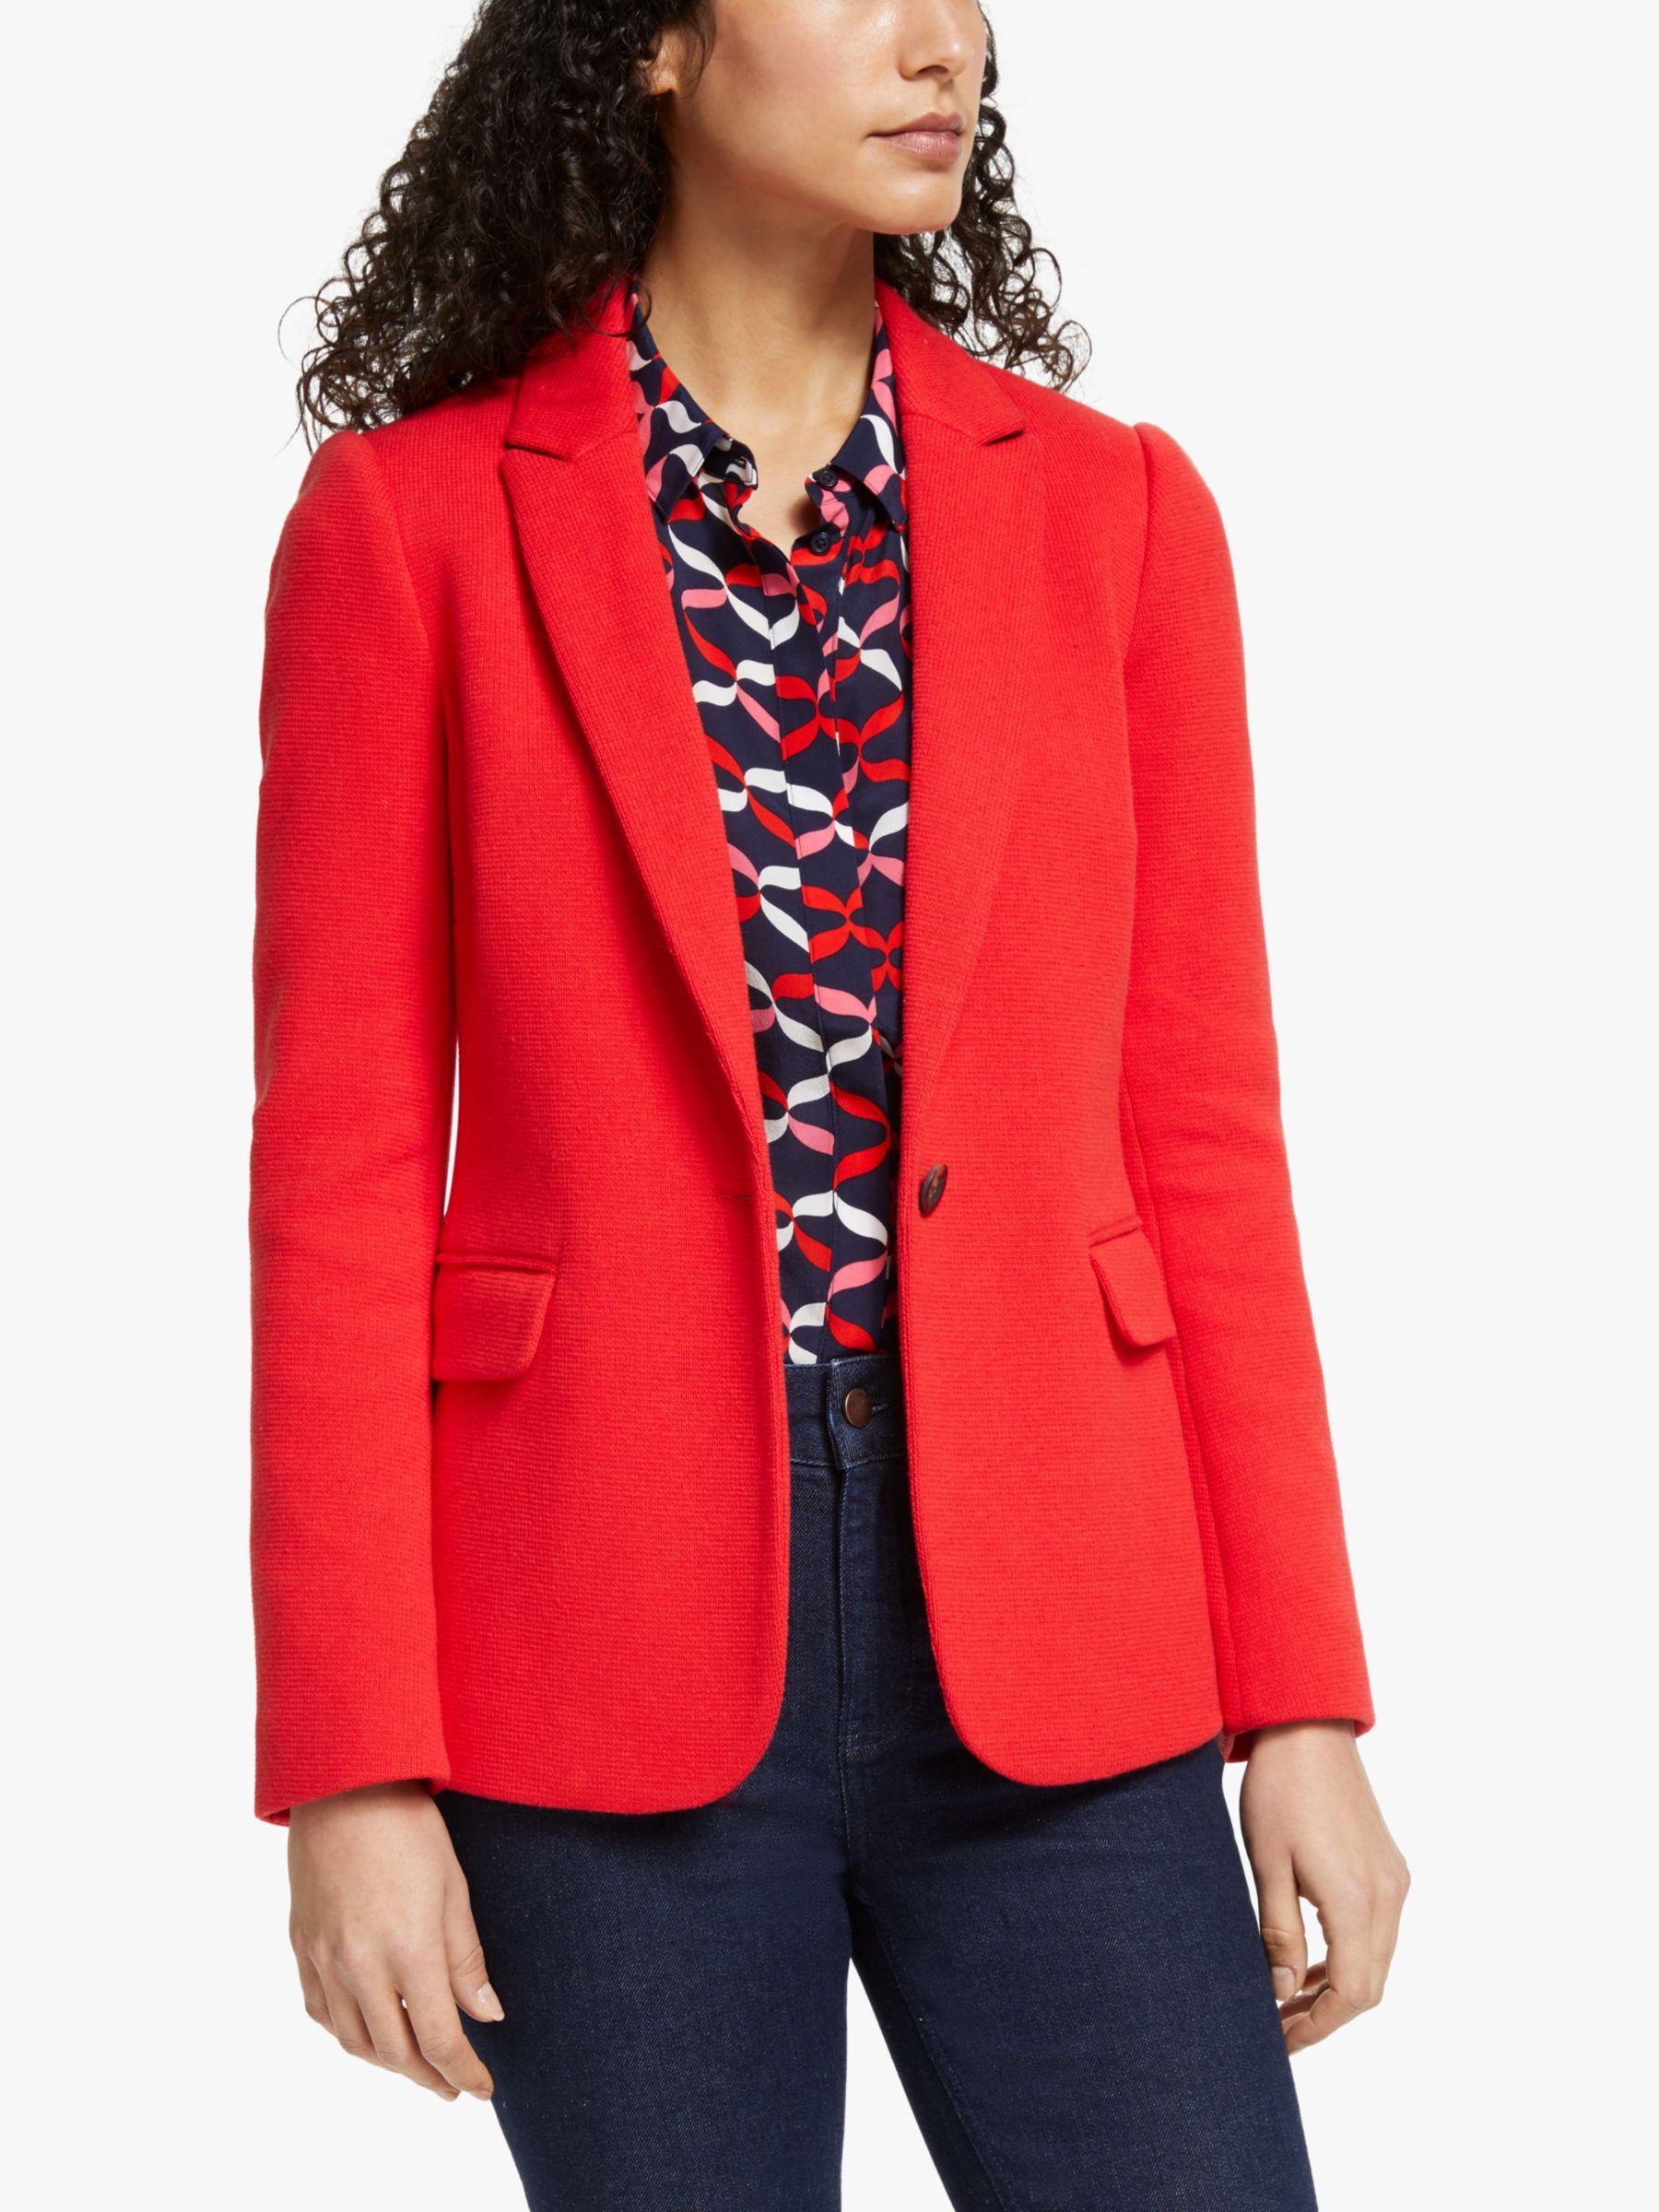 Boden Boden Hall Jersey Blazer Jacket, Post Box Red